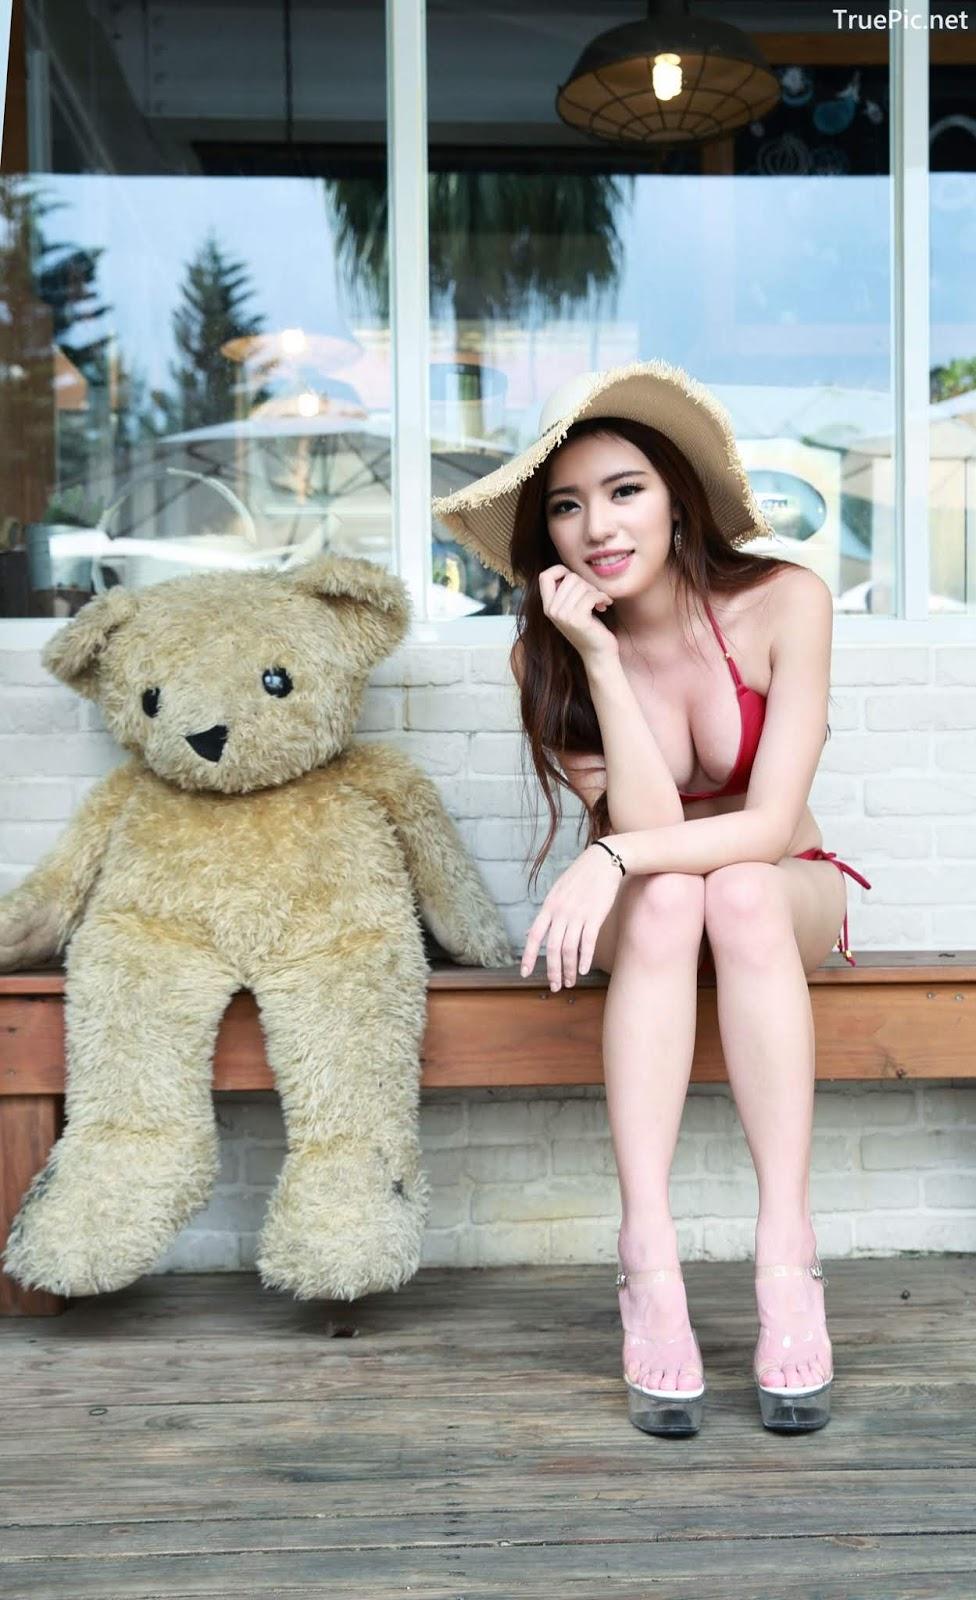 Image-Taiwanese-Model-Kiki-謝立琪-Lovely-And-Beautiful-Bikini-Girl-TruePic.net- Picture-8